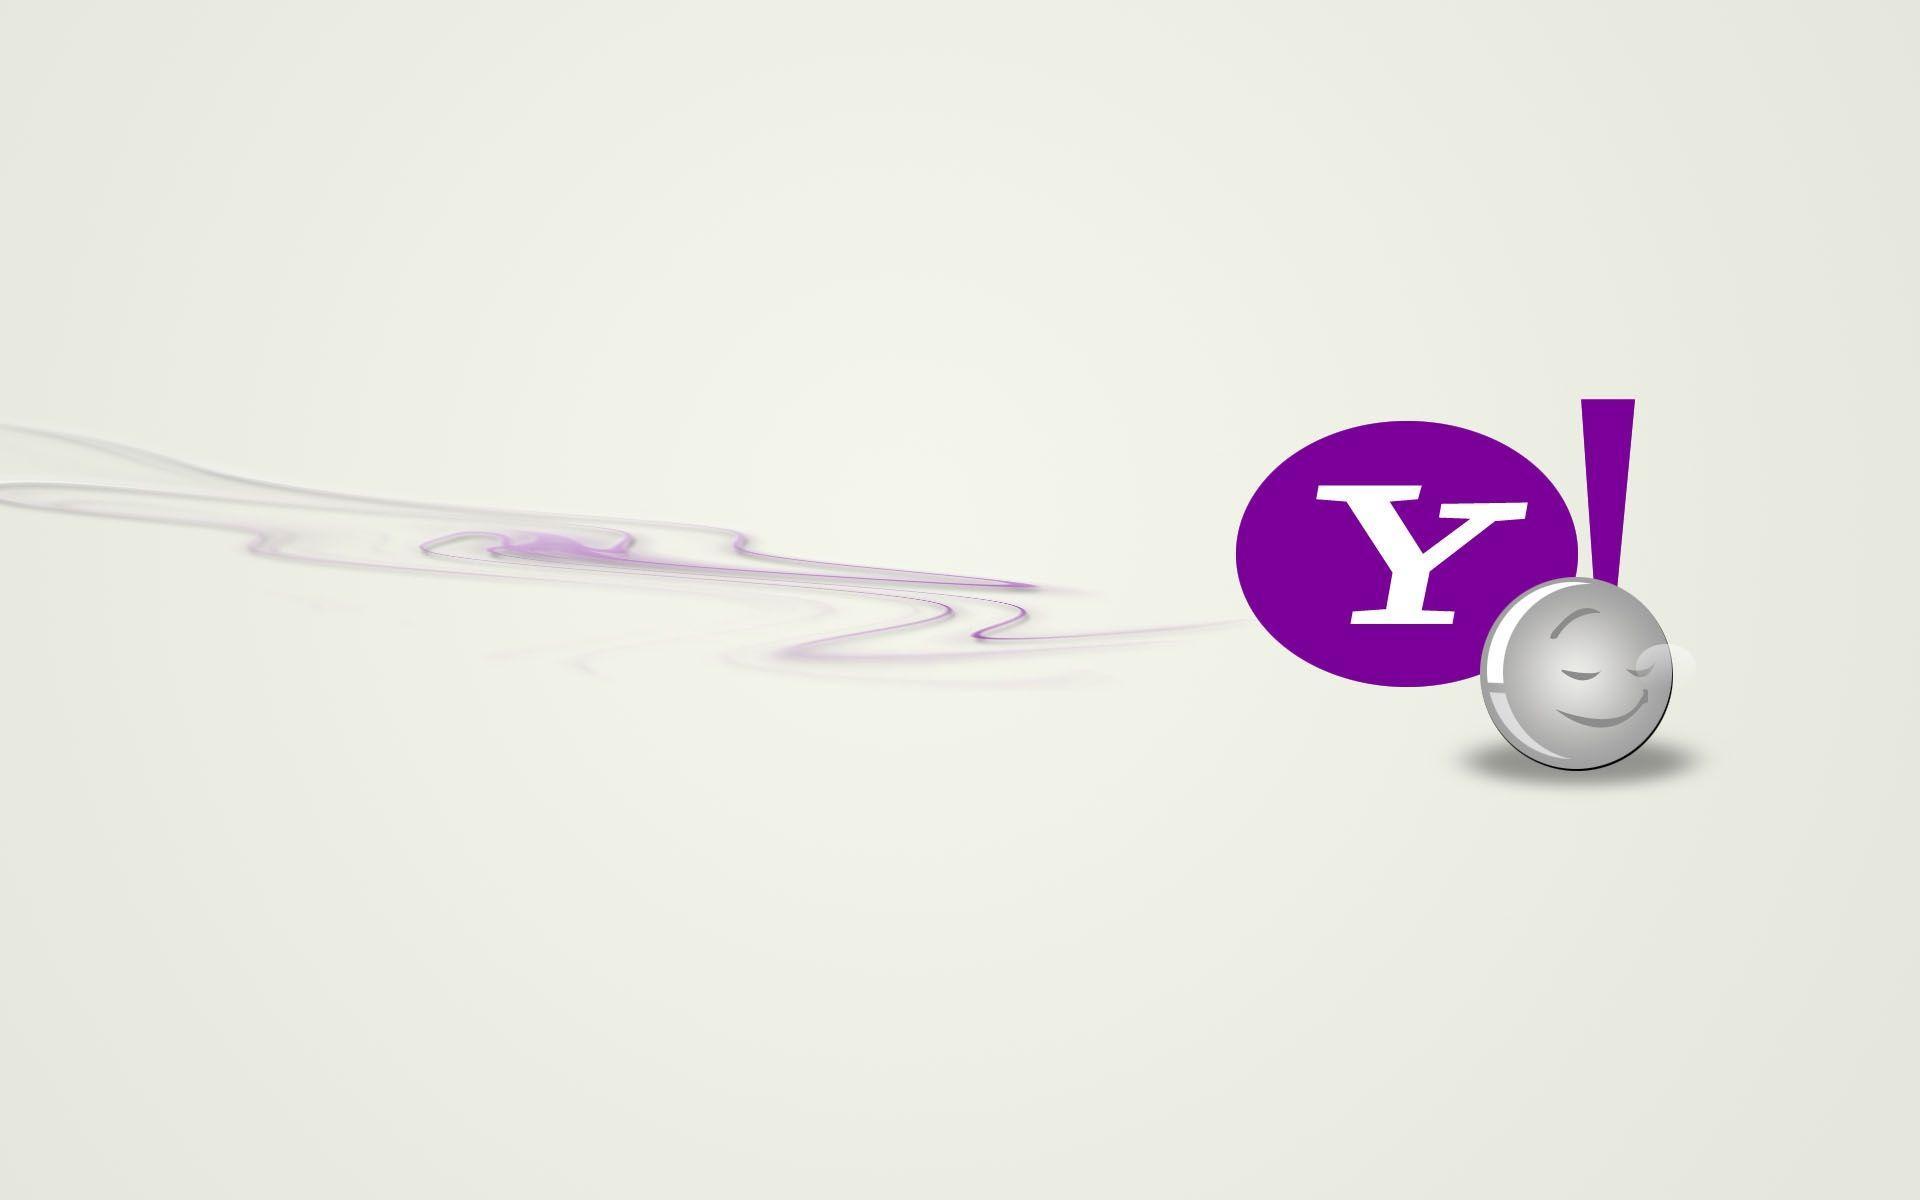 Yahoo HD Wallpapers - HD Wallpapers Inn